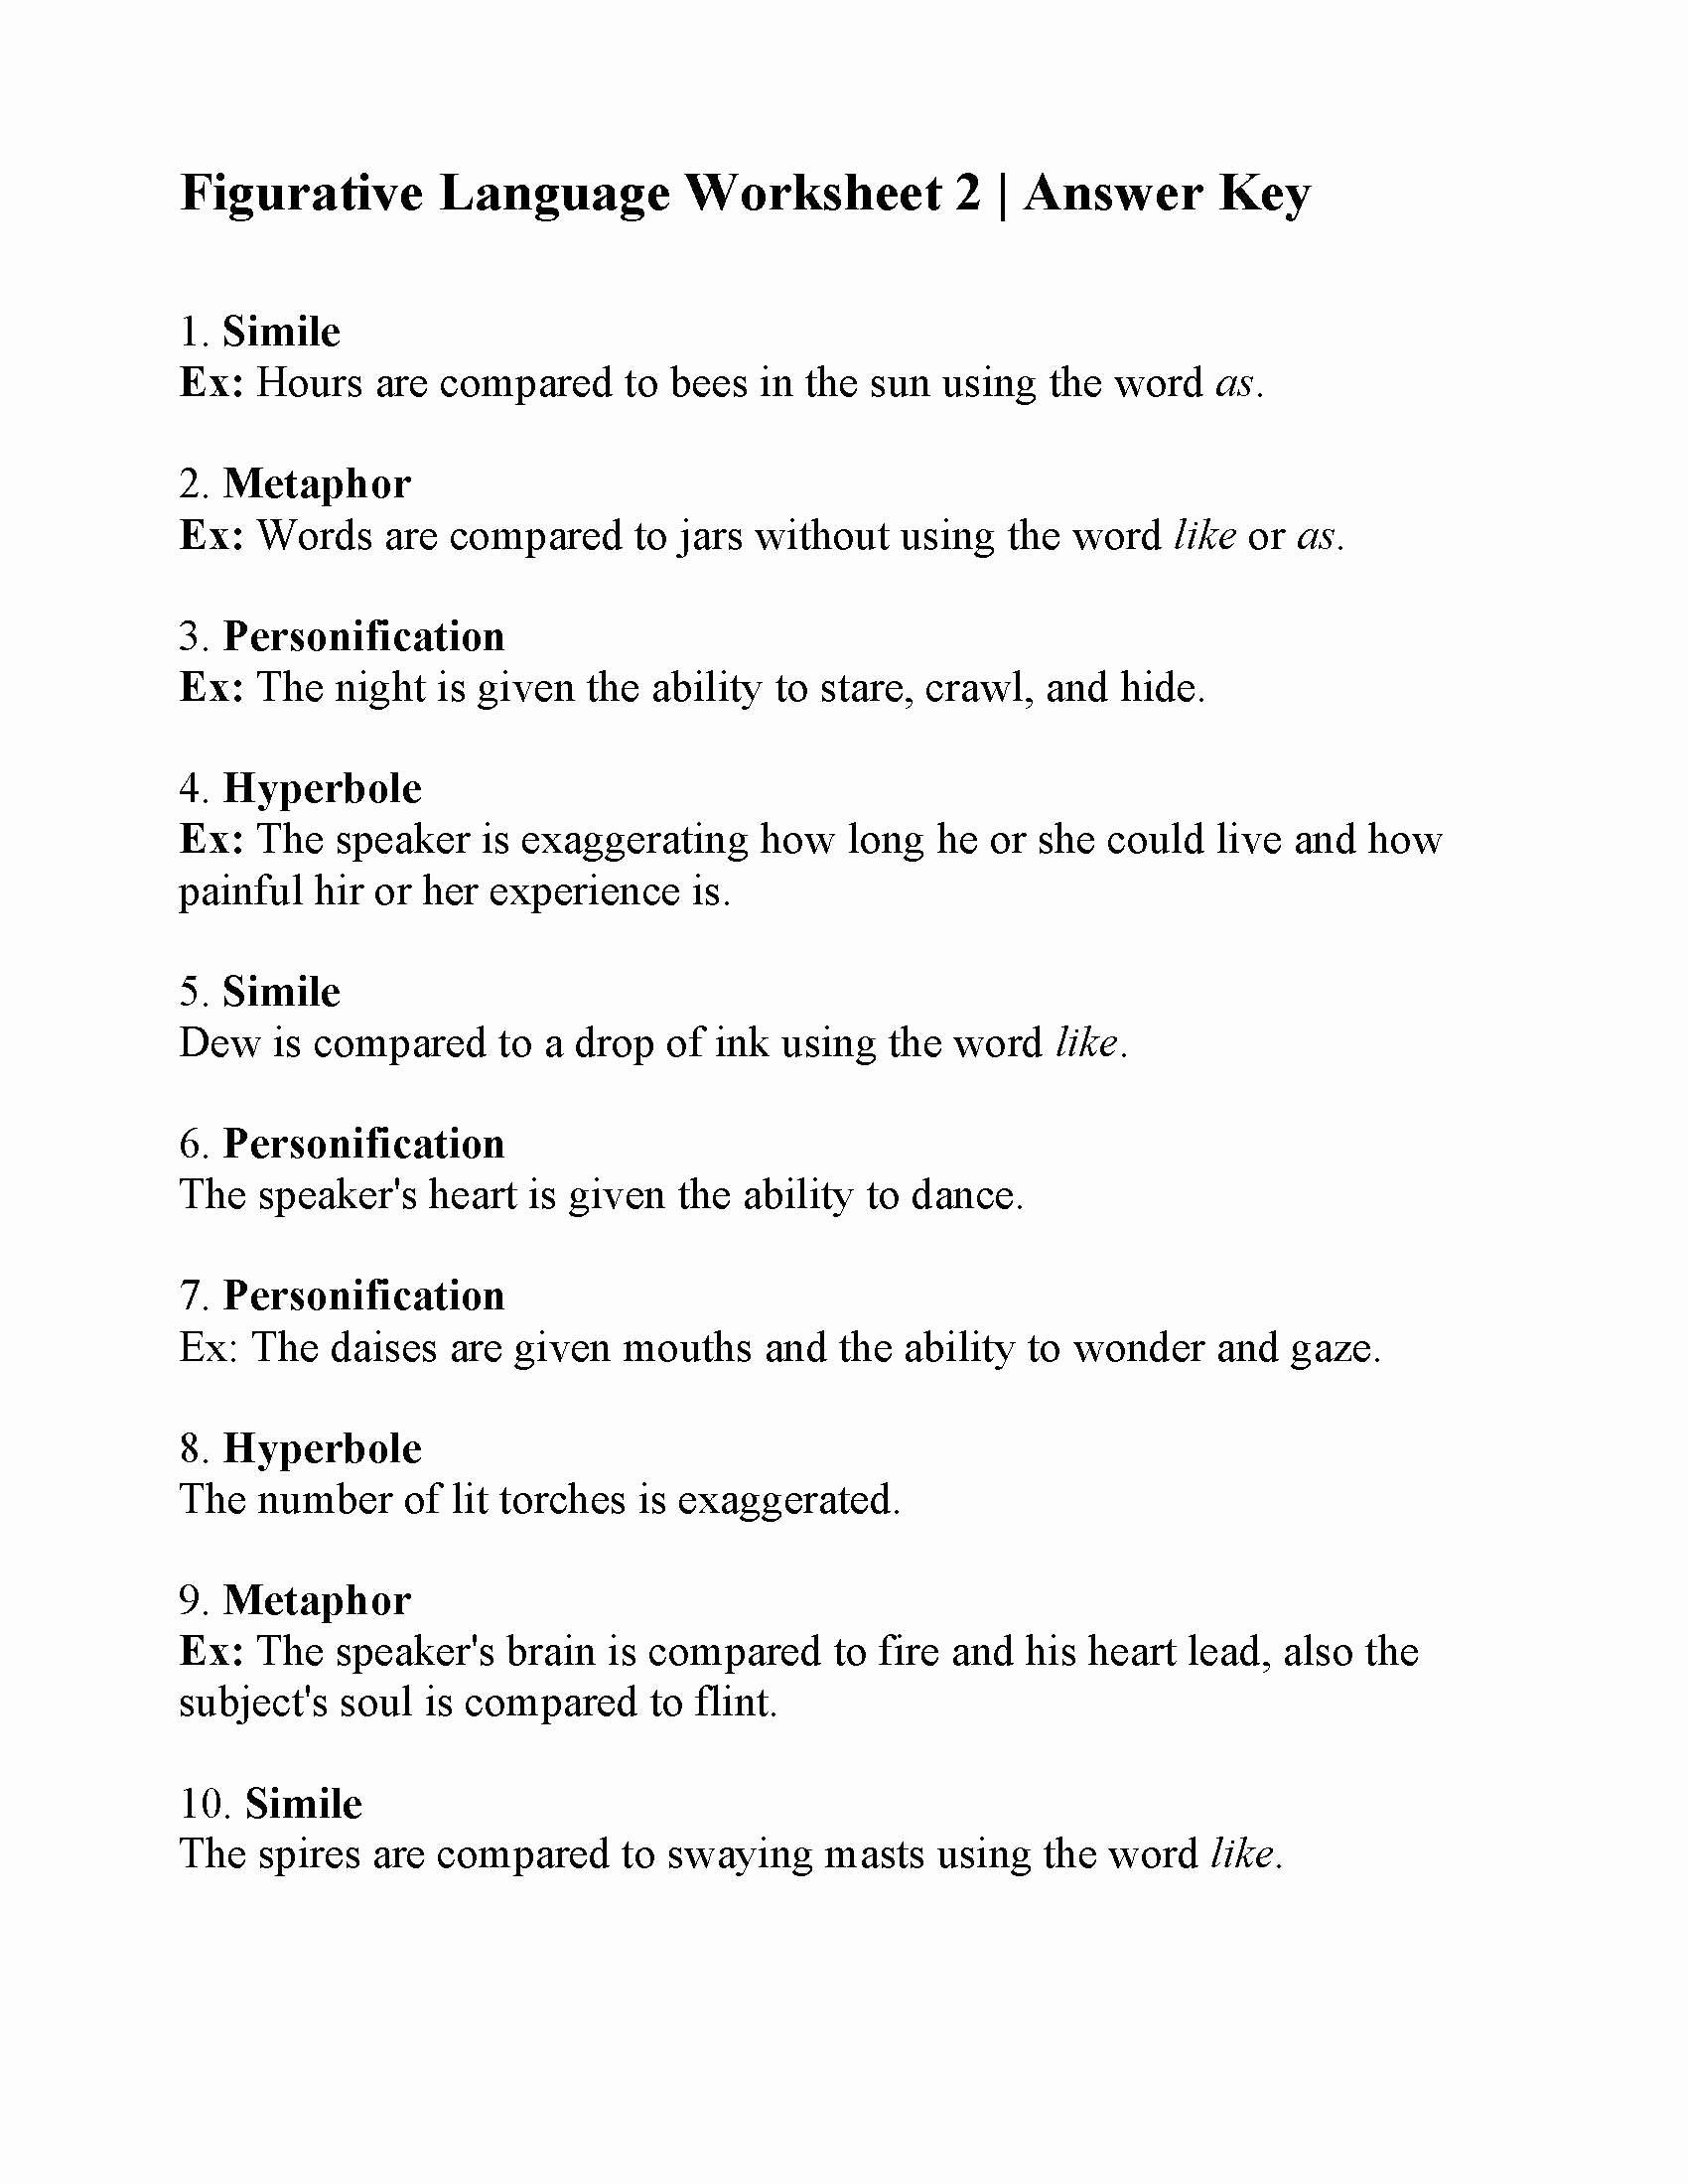 Figurative Language Worksheets 6th Grade Inspirational Figurative Language Worksheets